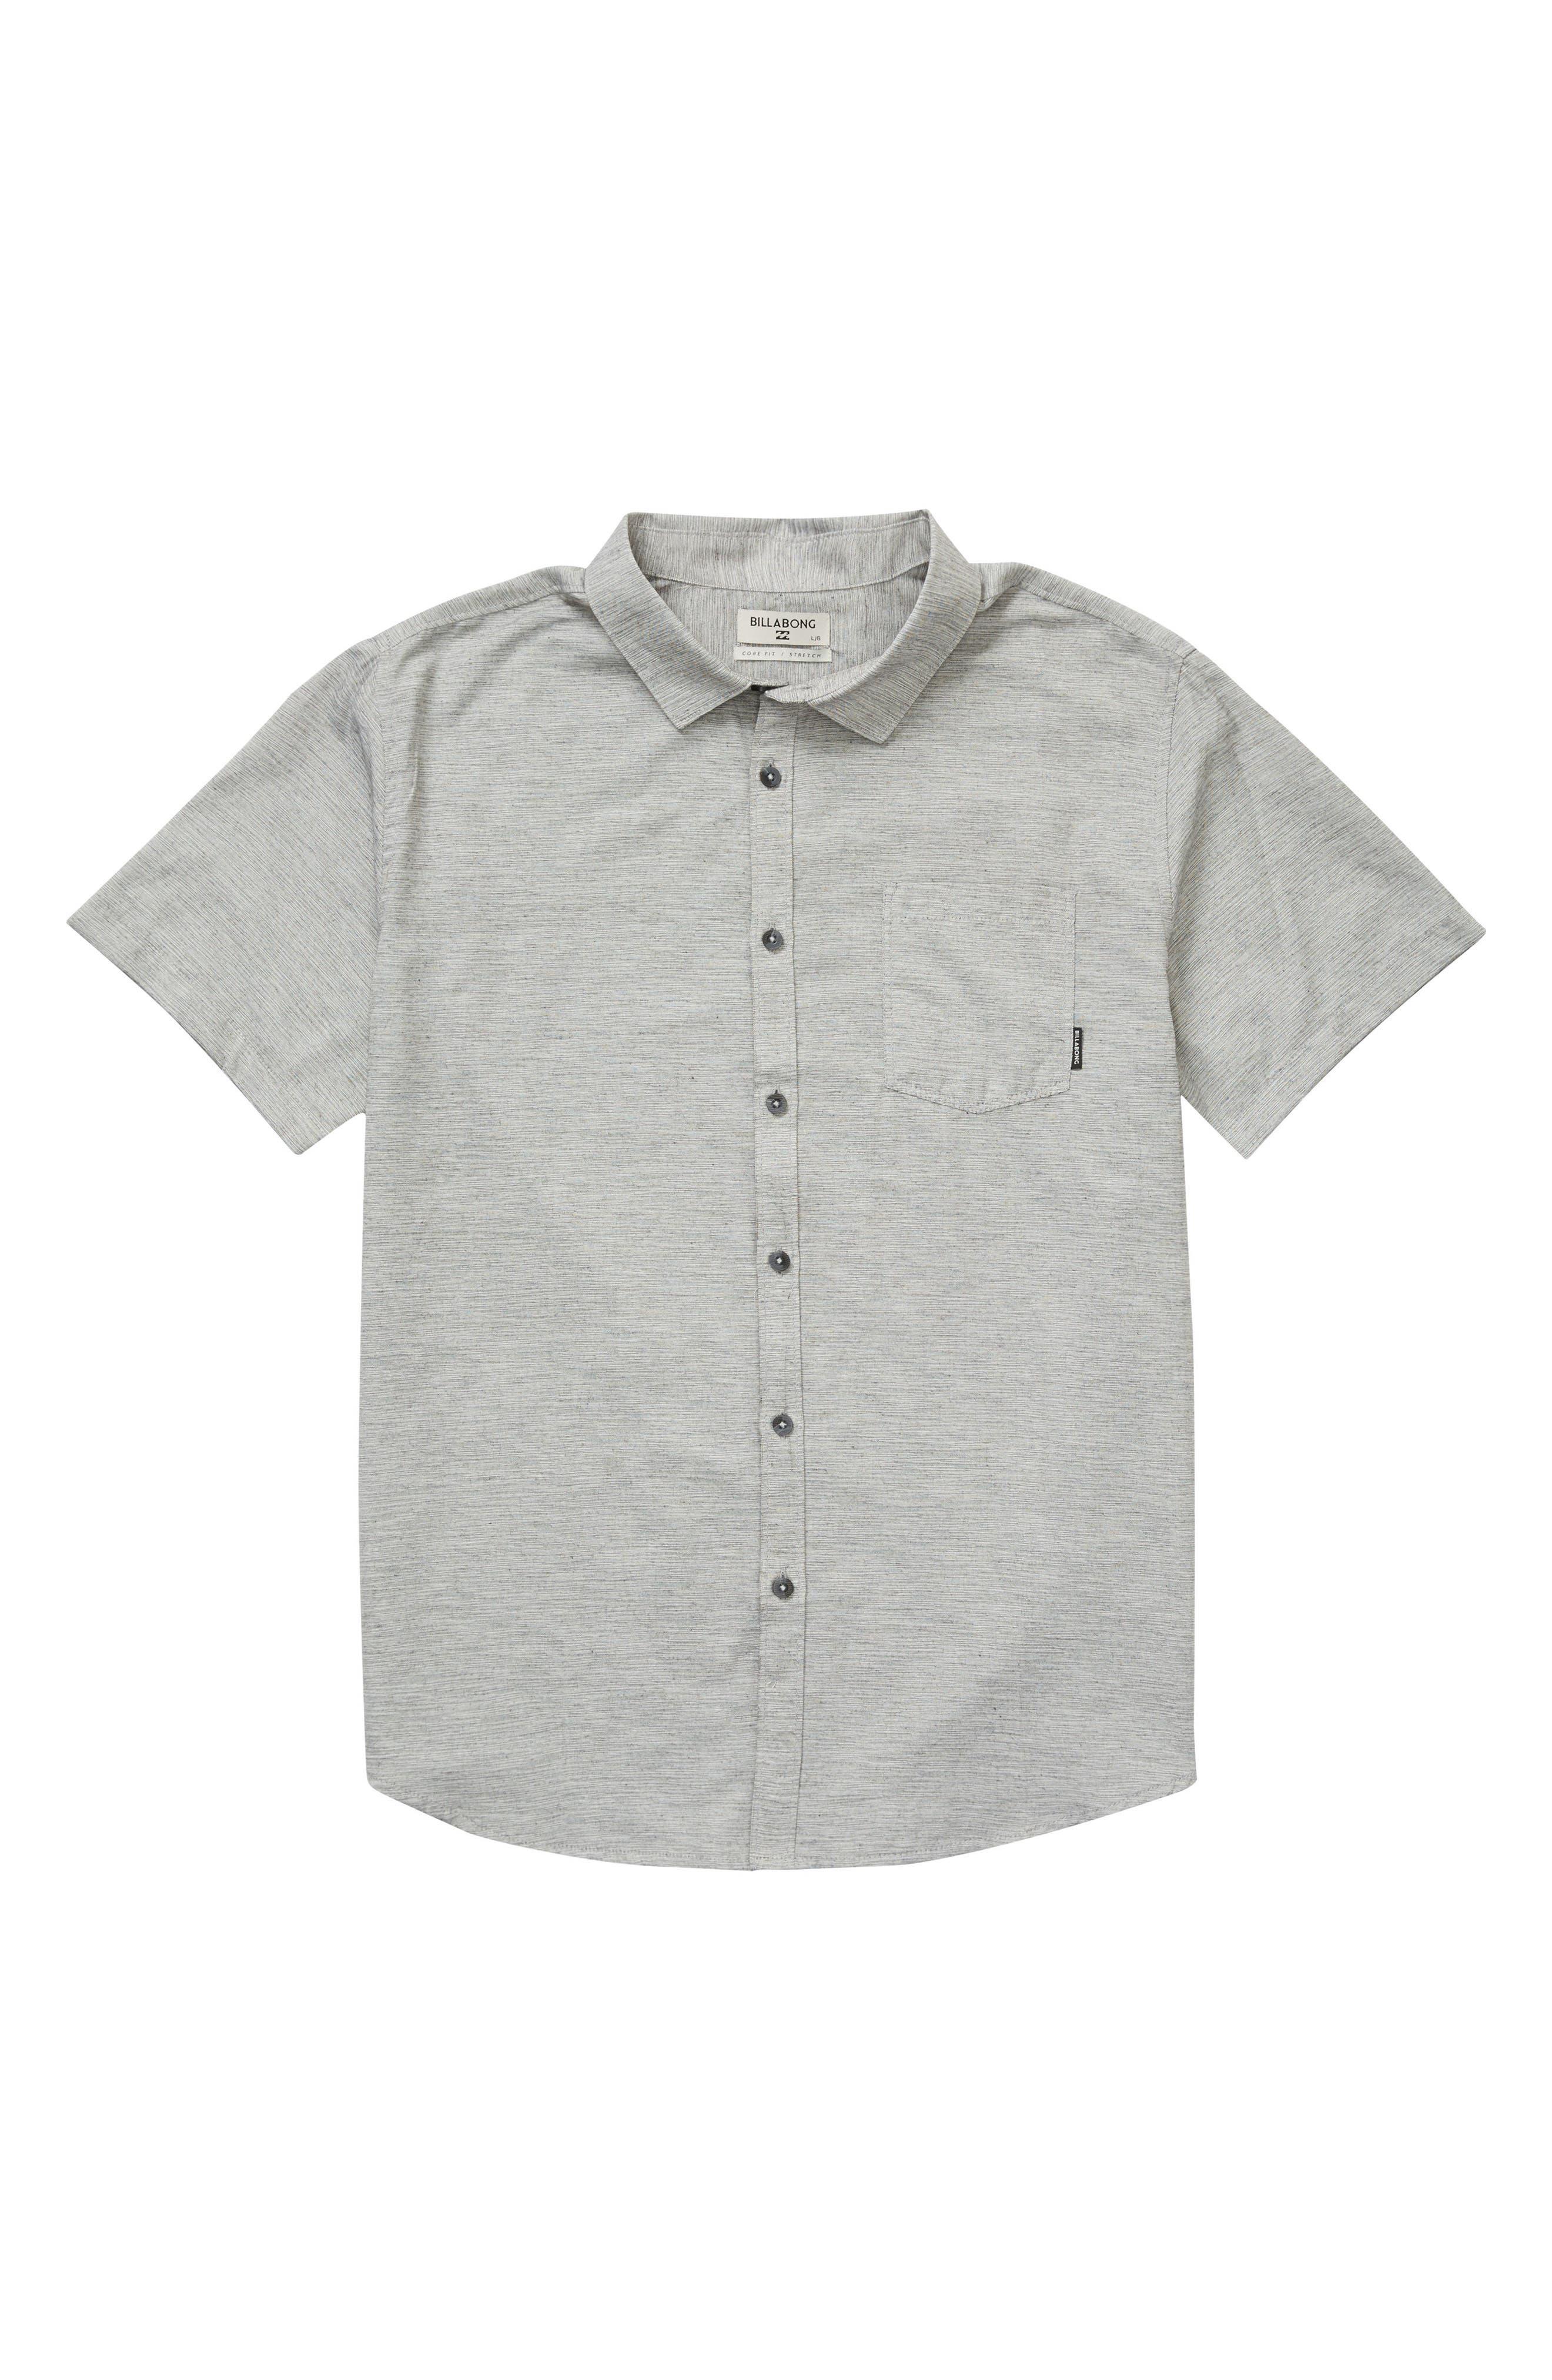 All Day Helix Woven Shirt,                             Main thumbnail 1, color,                             060